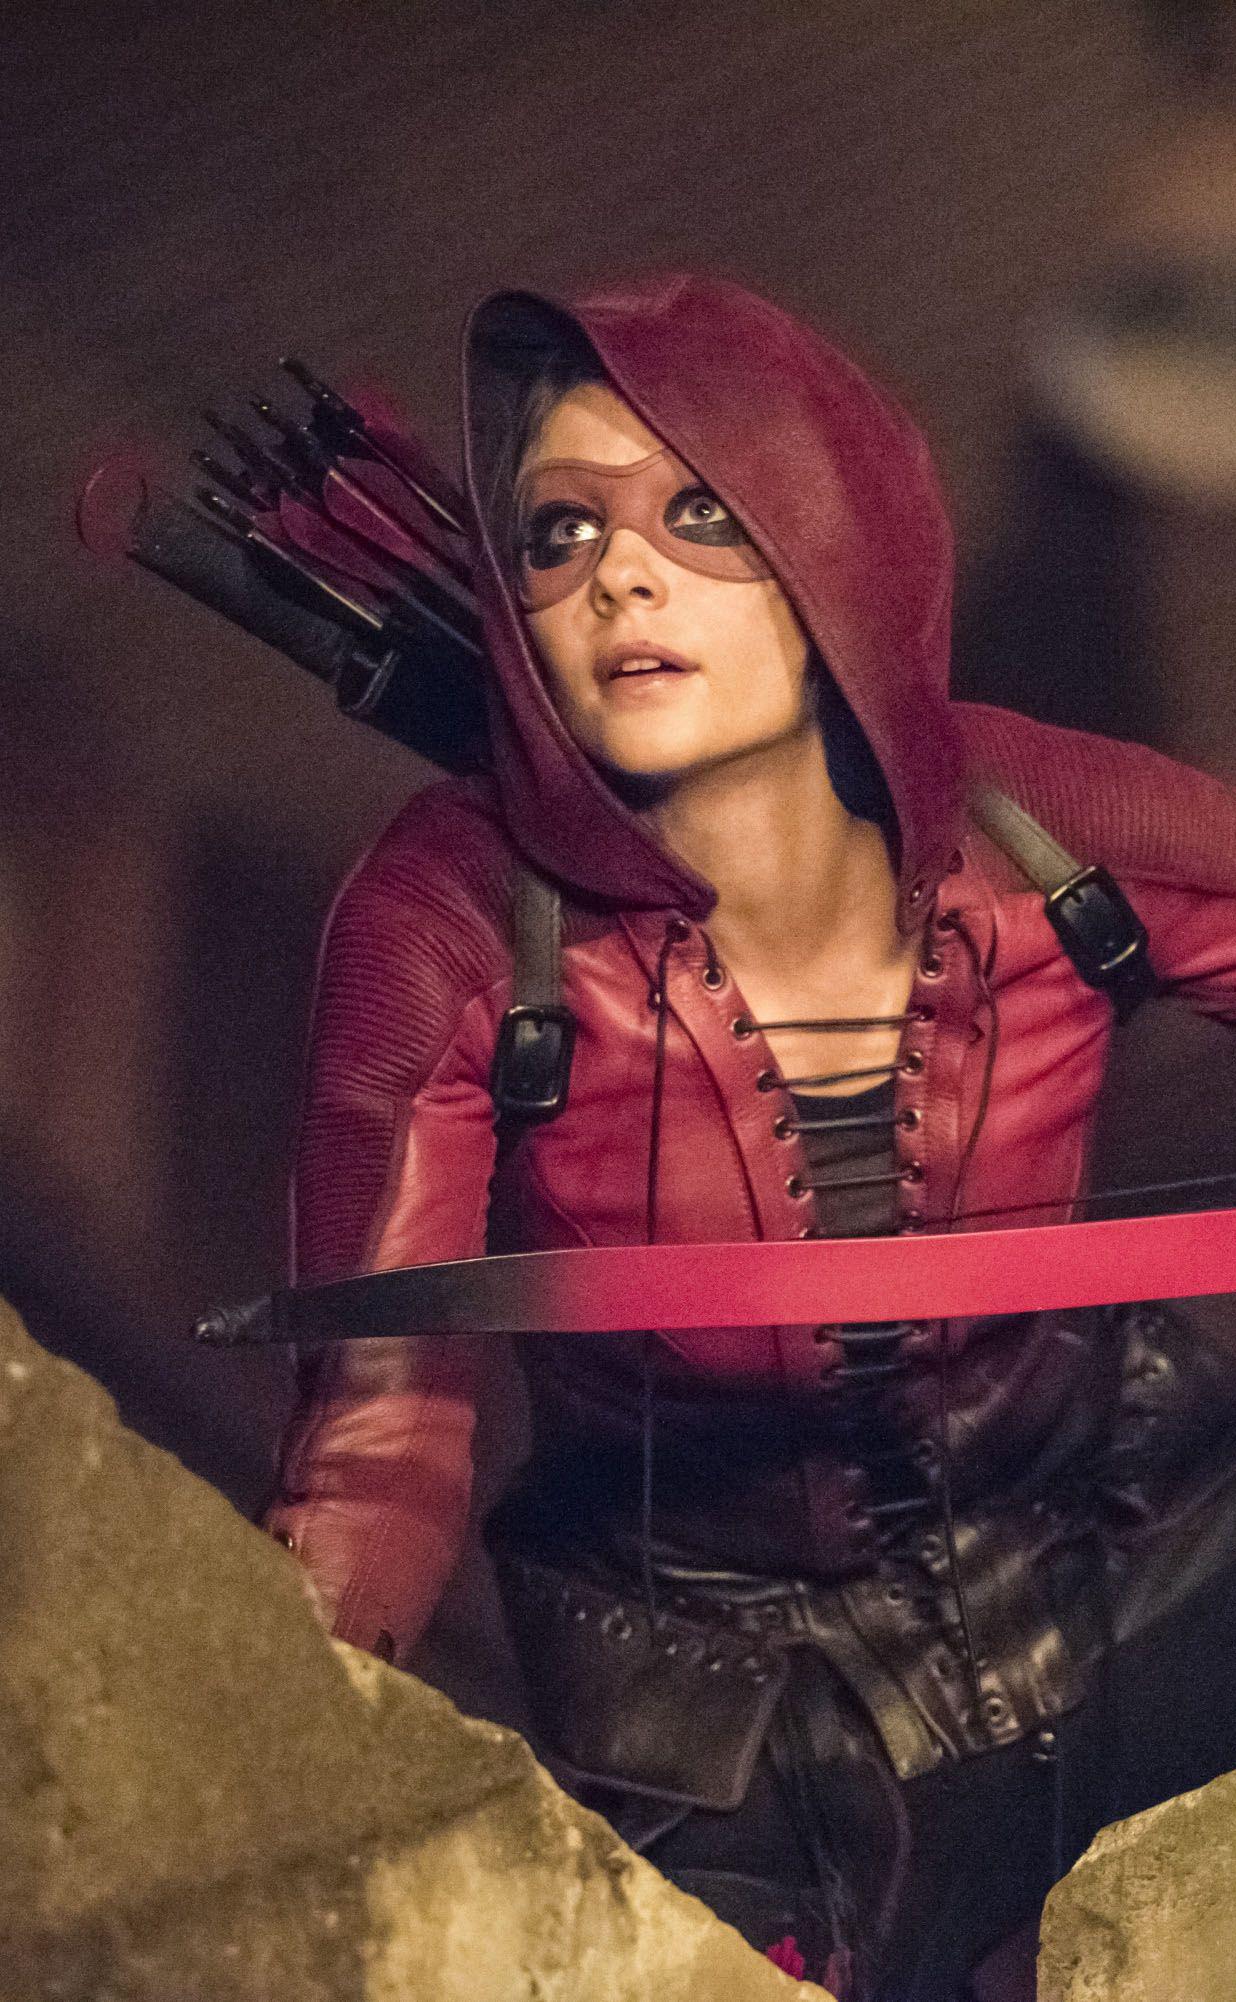 Arrow 4x01 - Green Arrow - Thea Queen / Speedy #arrow #thearrow #greenarrow #thecw #kurttasche